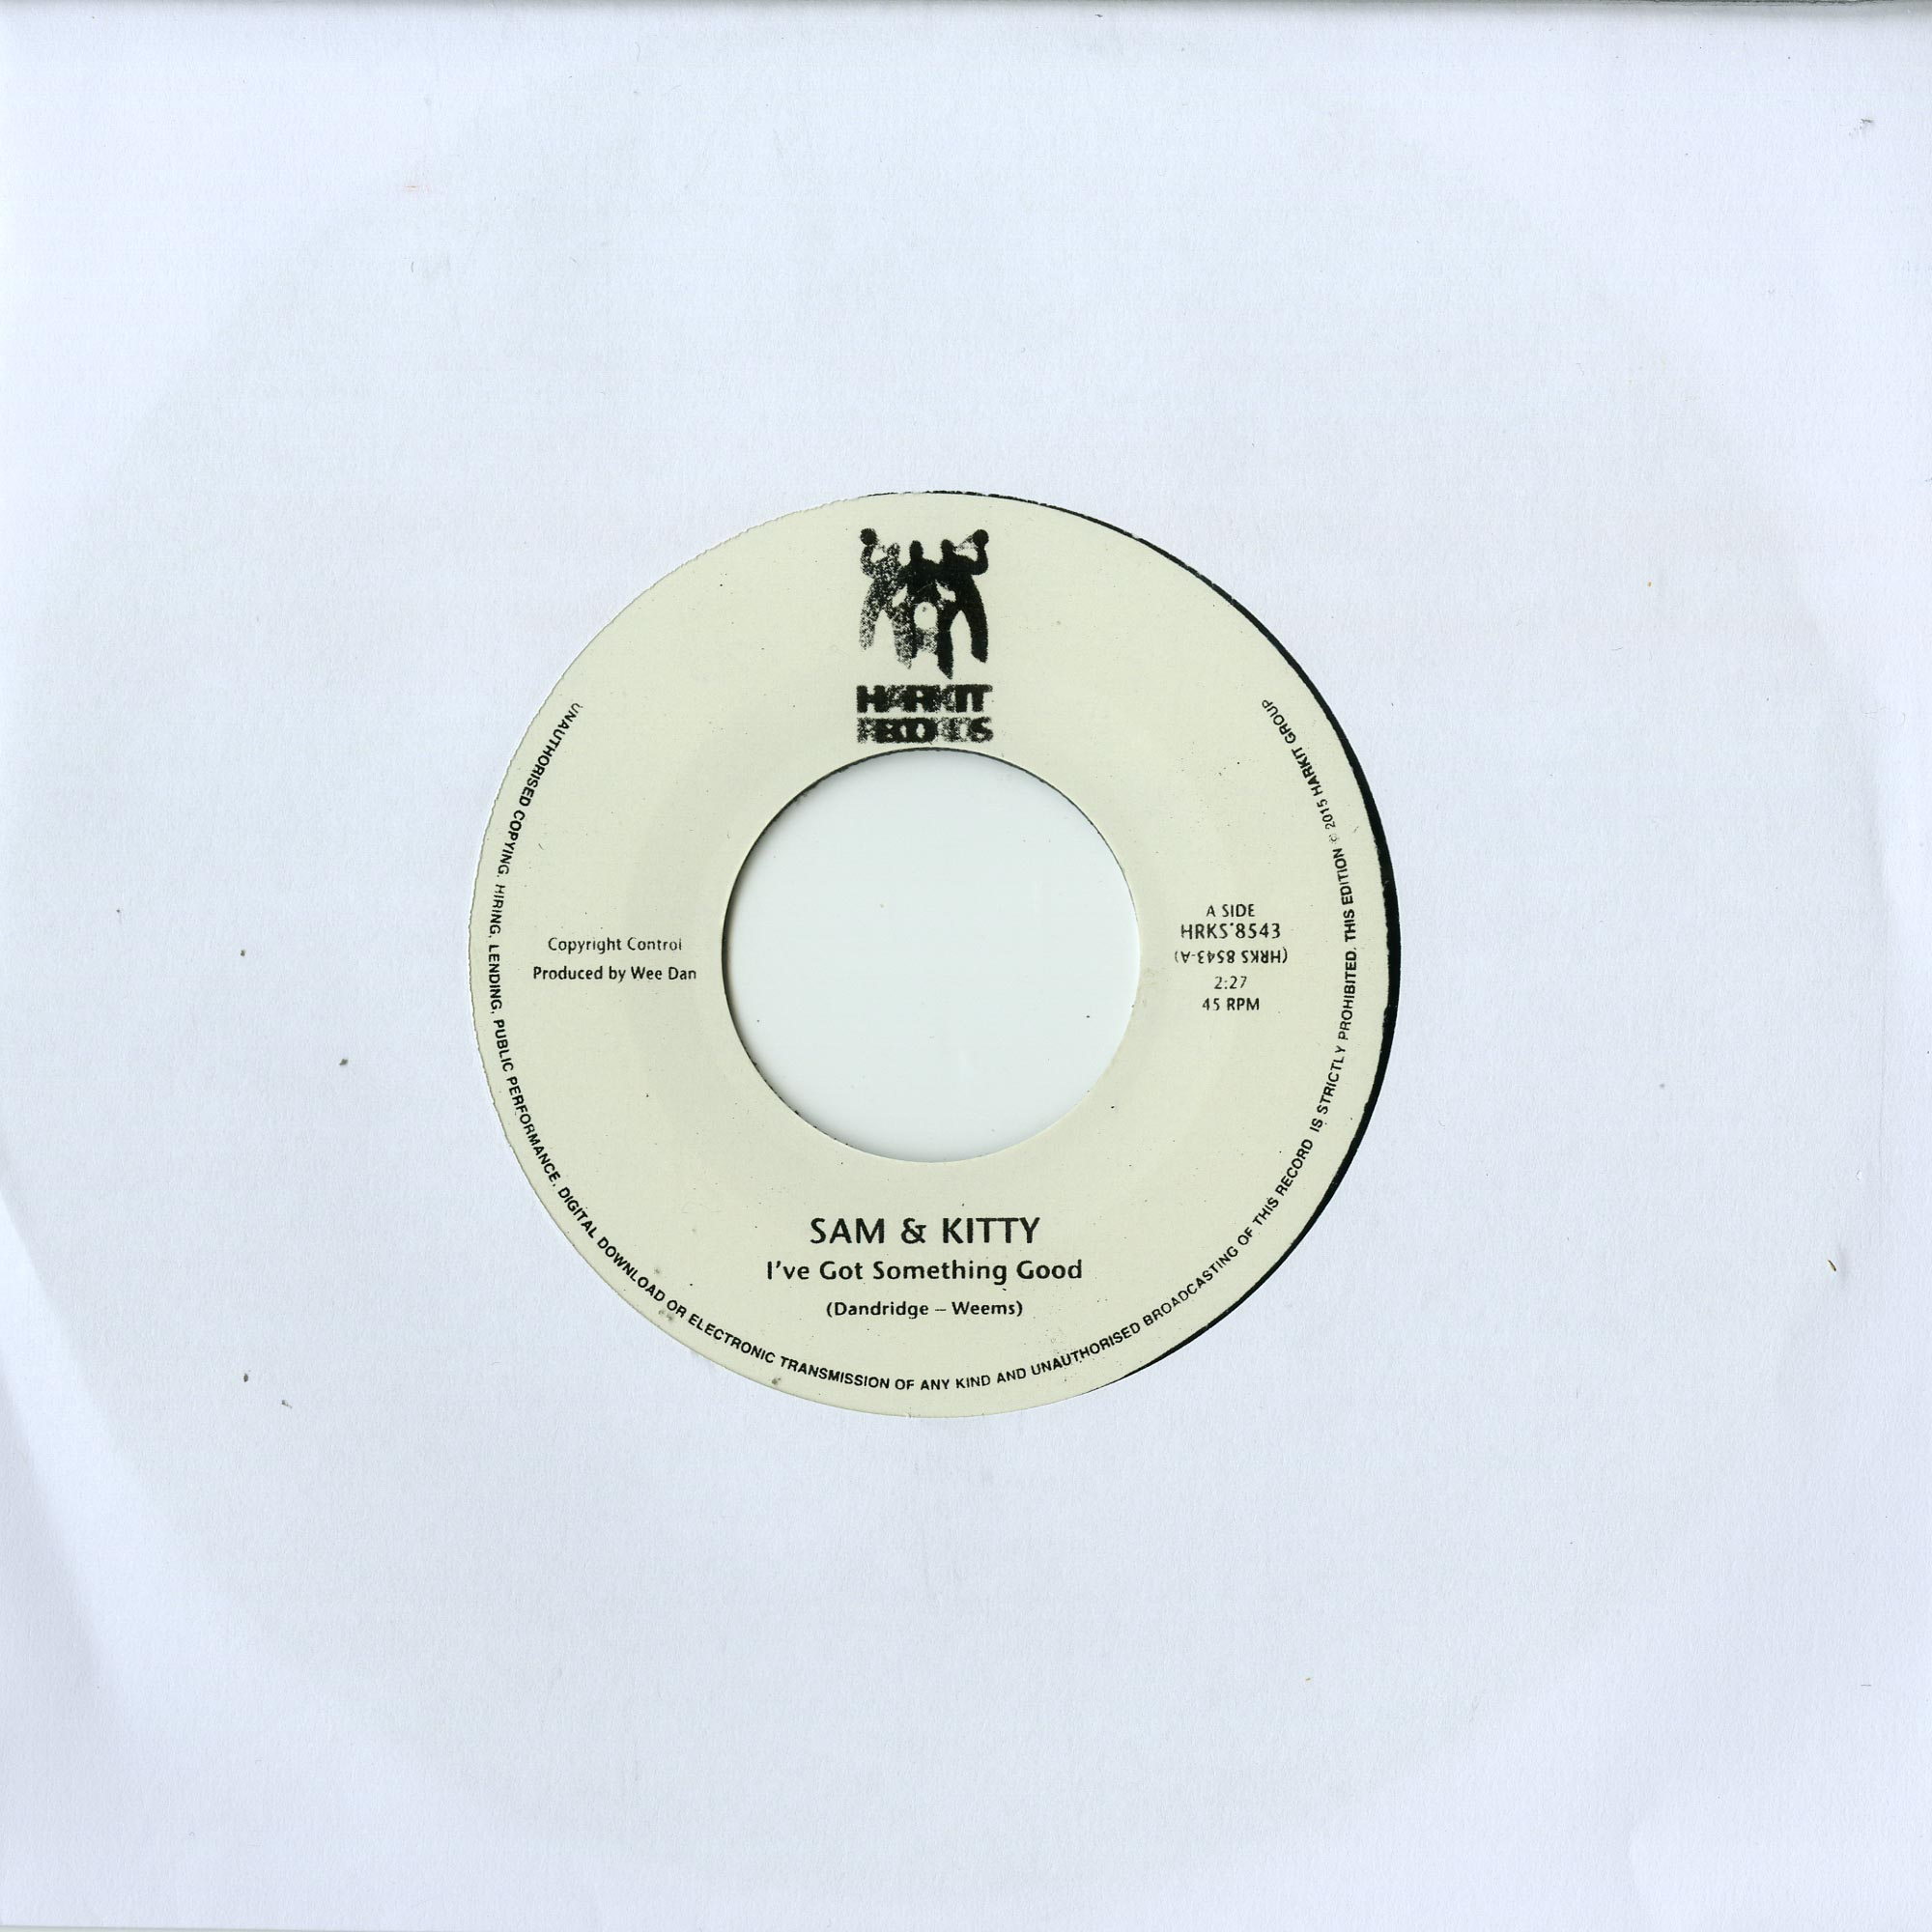 Sam & Kitty. Johnny Sayles - I VE GOT SOMETHING GOOD / I CANT GET ENOUGH